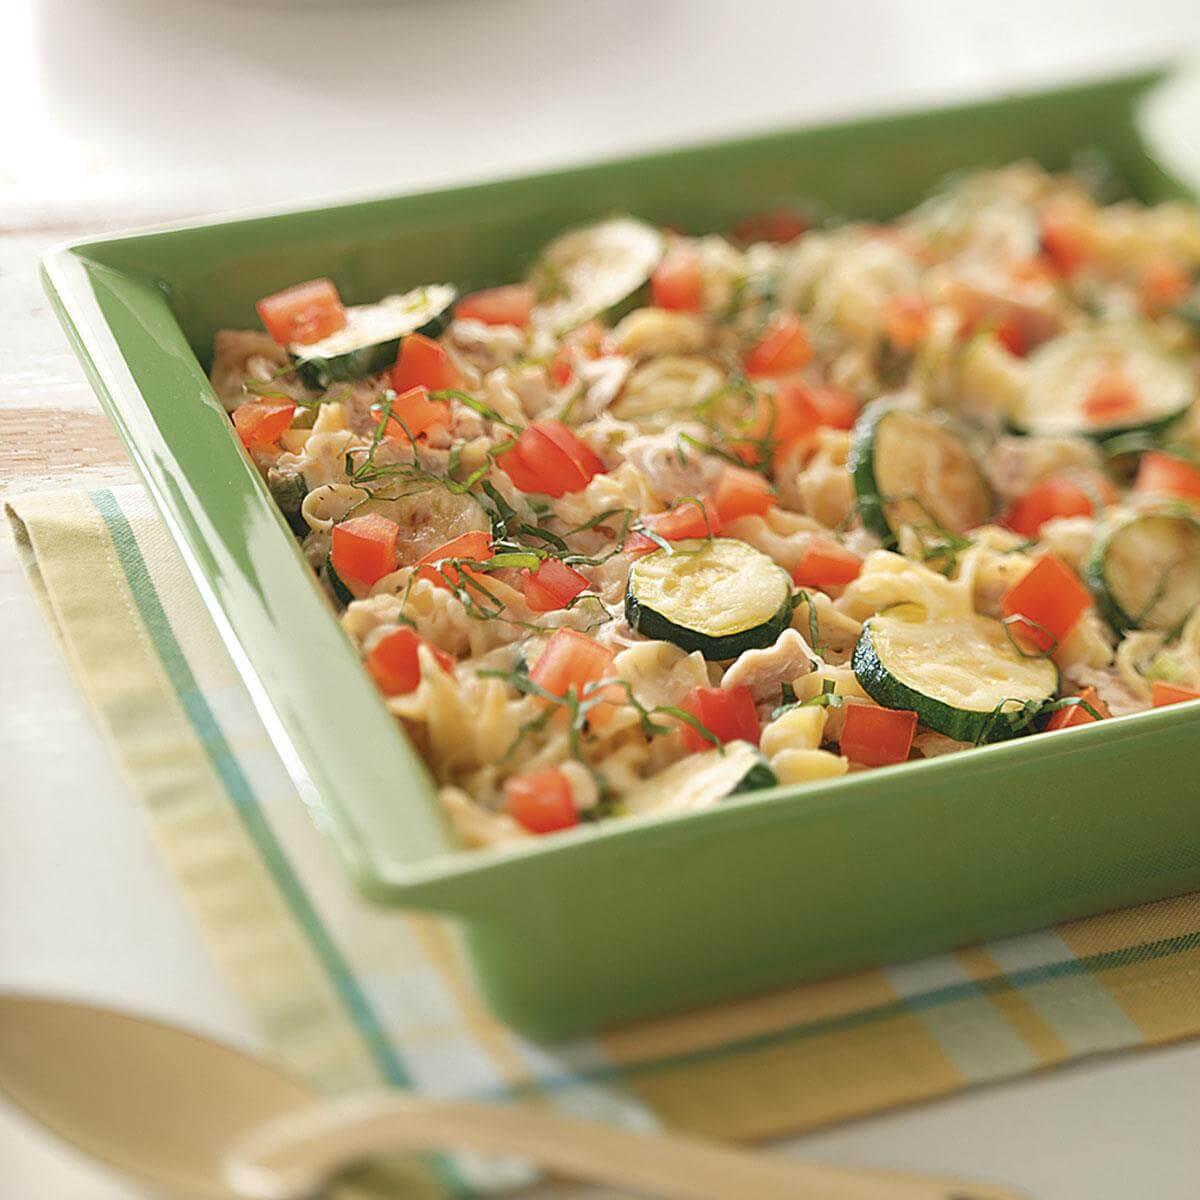 Egg Noodle Casserole Recipes Vegetarian  Veggie Tuna Noodle Casserole Recipe